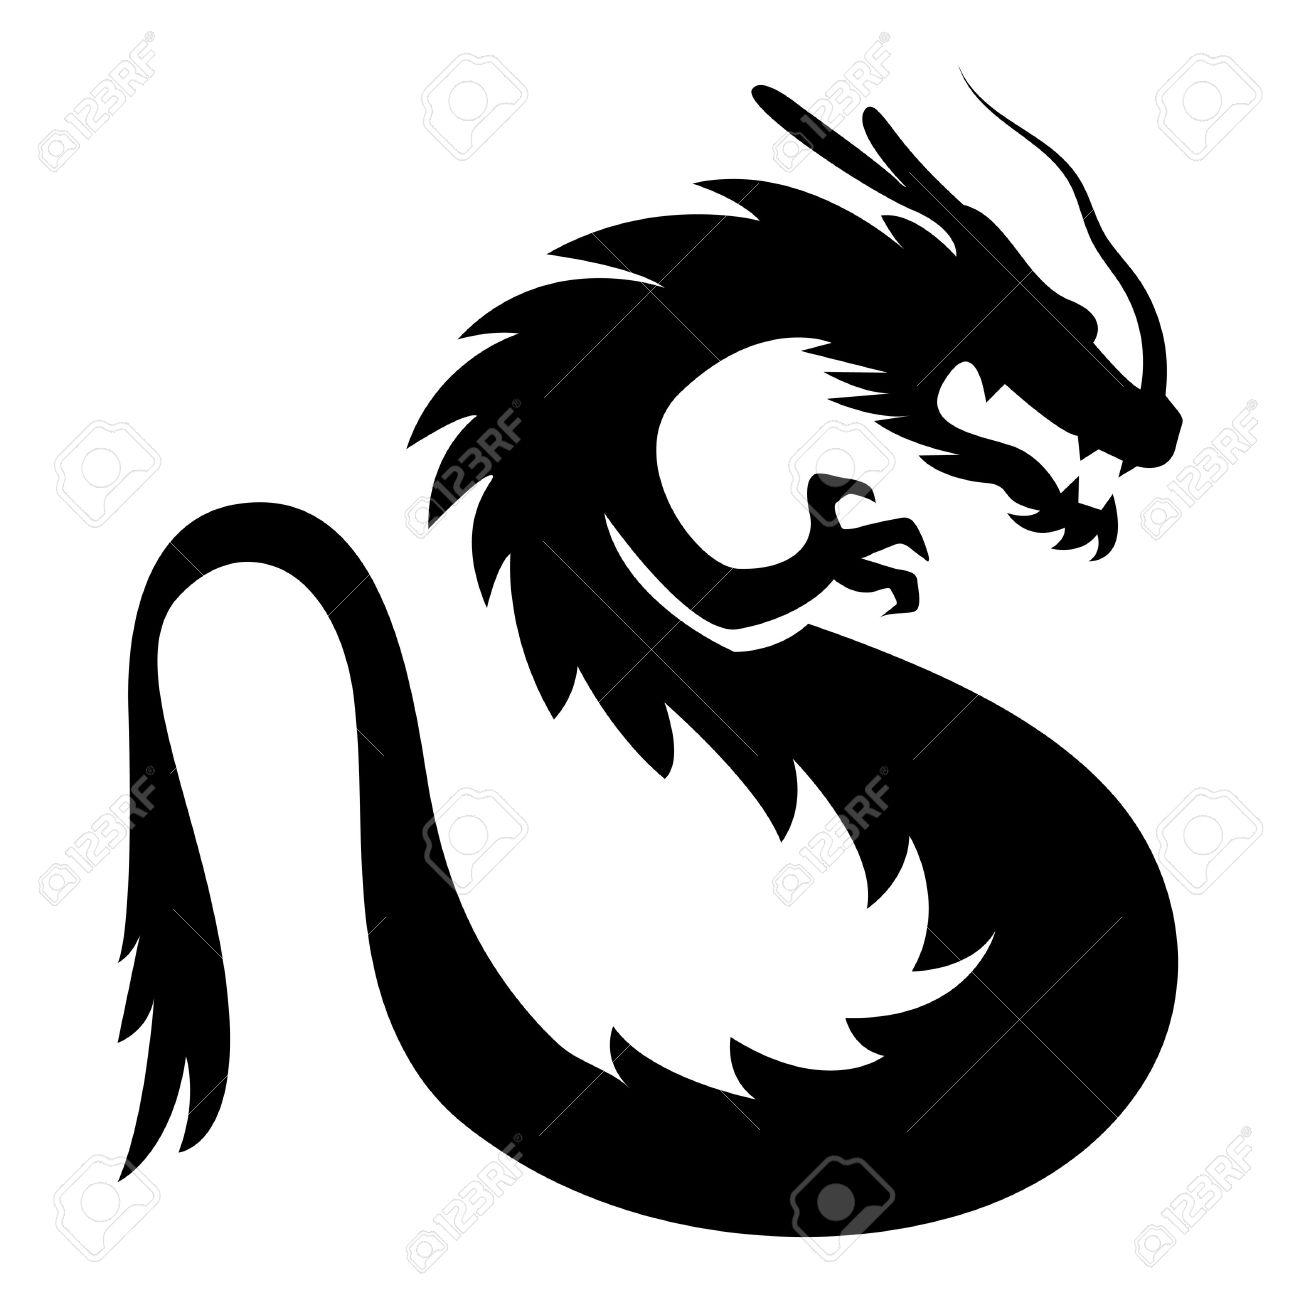 Vector Stylized Dragon Illustration Isolated On White Background - 43126688